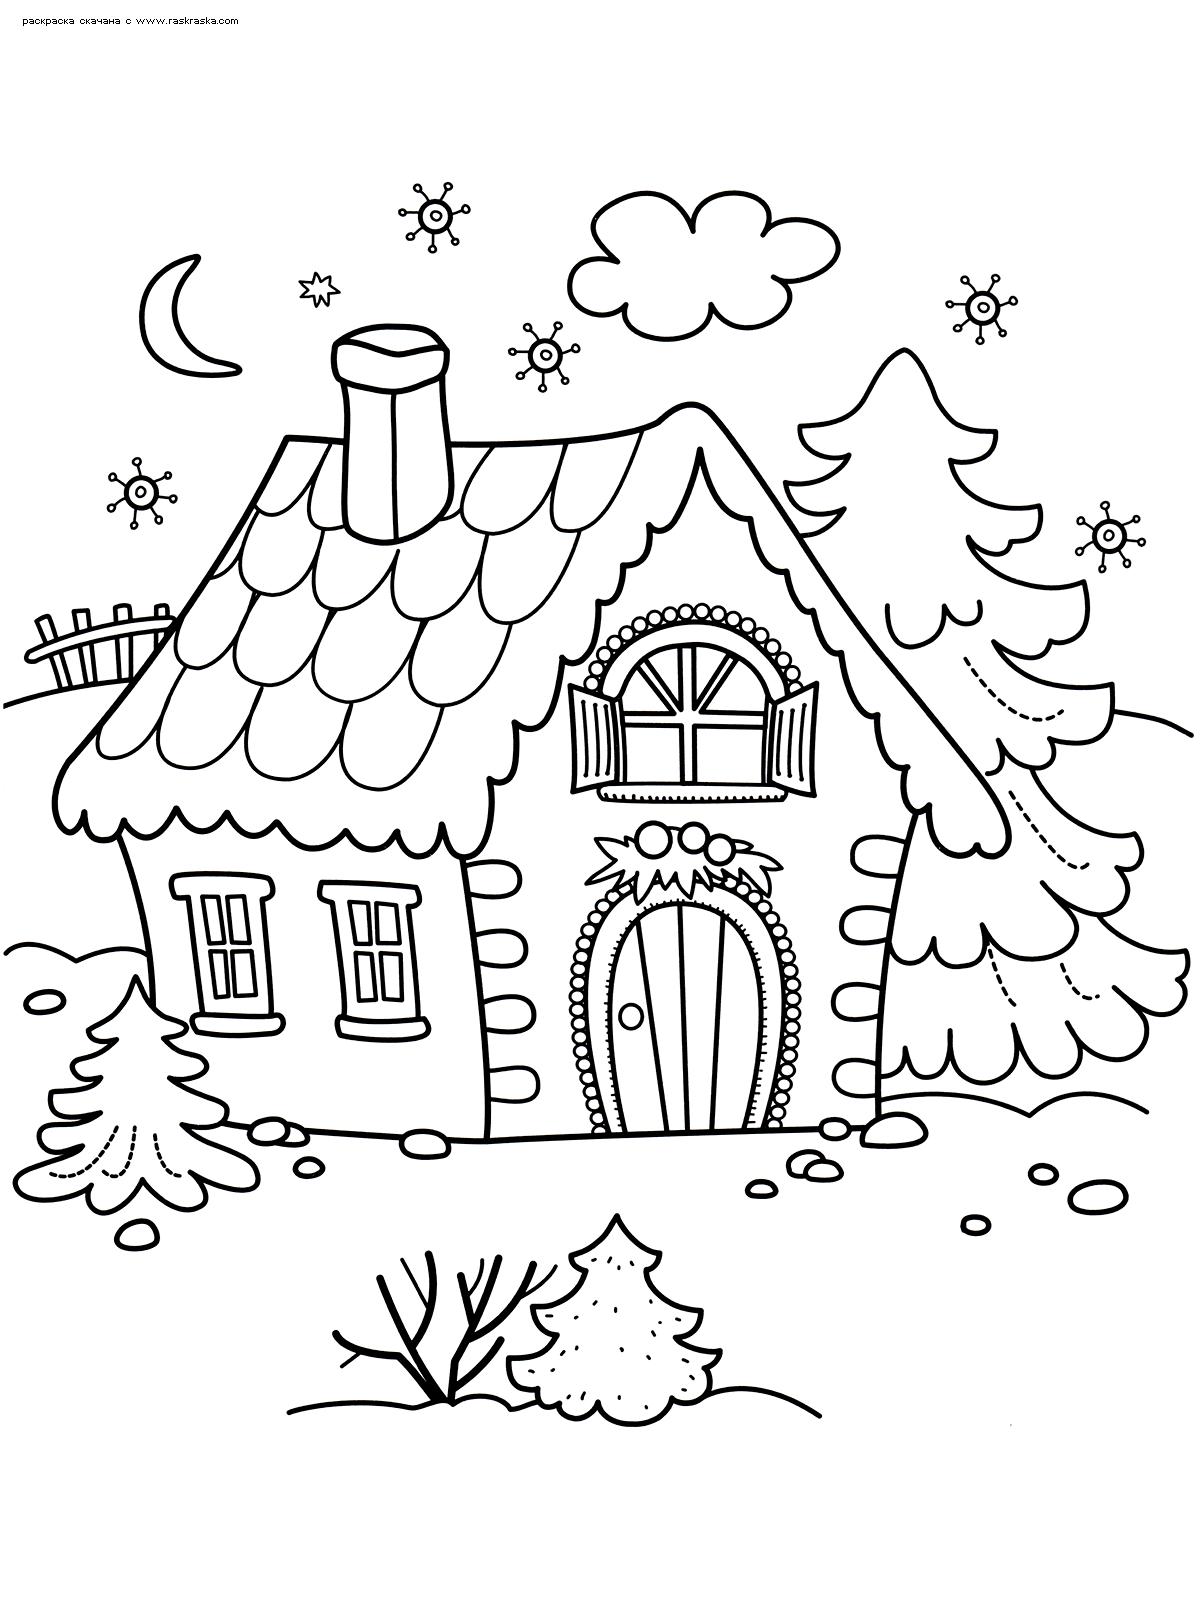 Раскраска Зимний домик. Раскраска зима, дом, елка